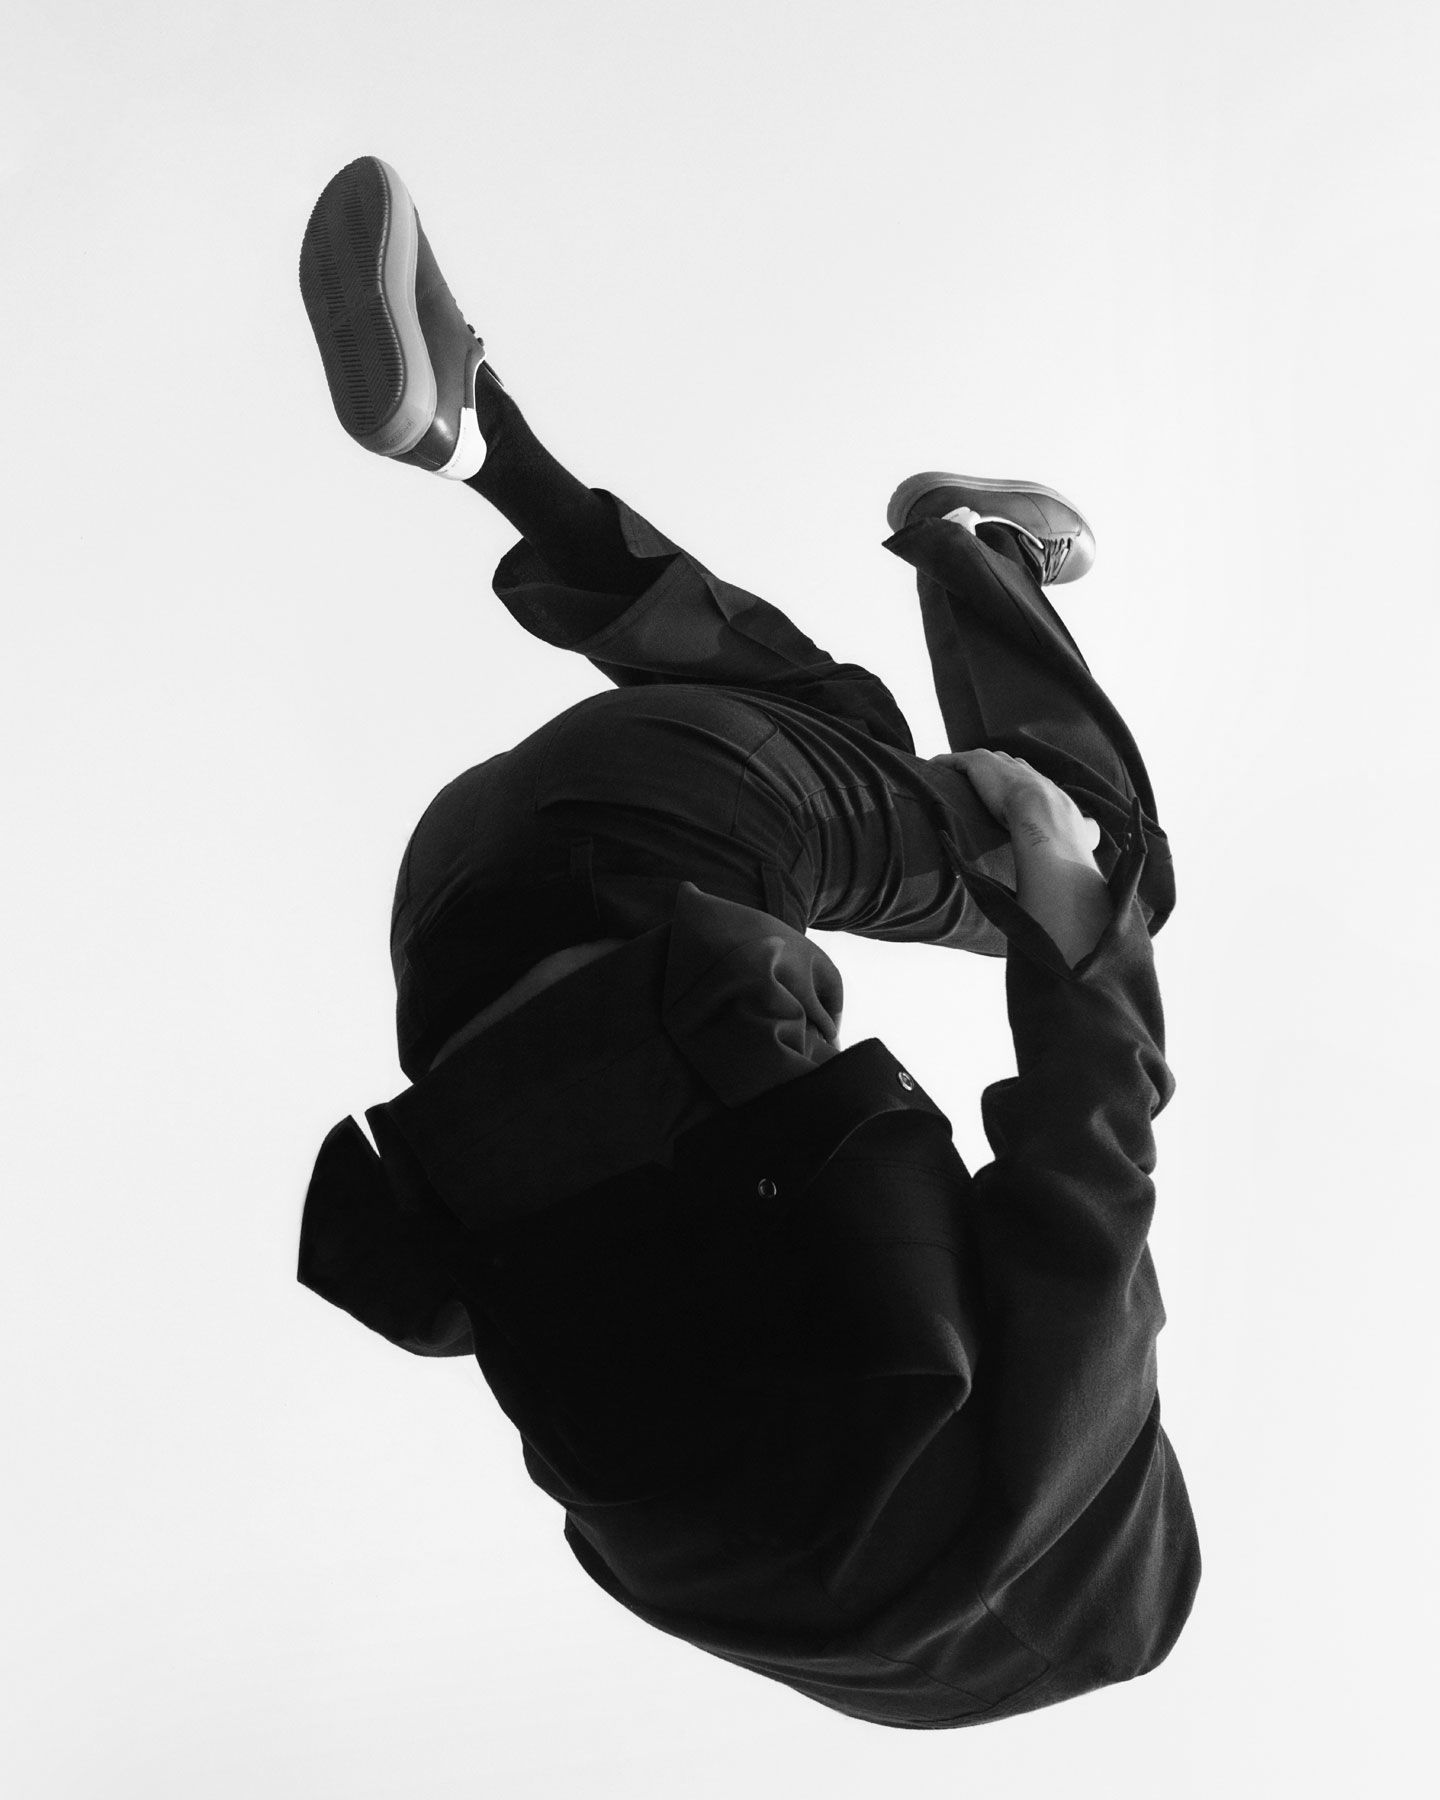 Mathieu fortin andrew kayla movement photography